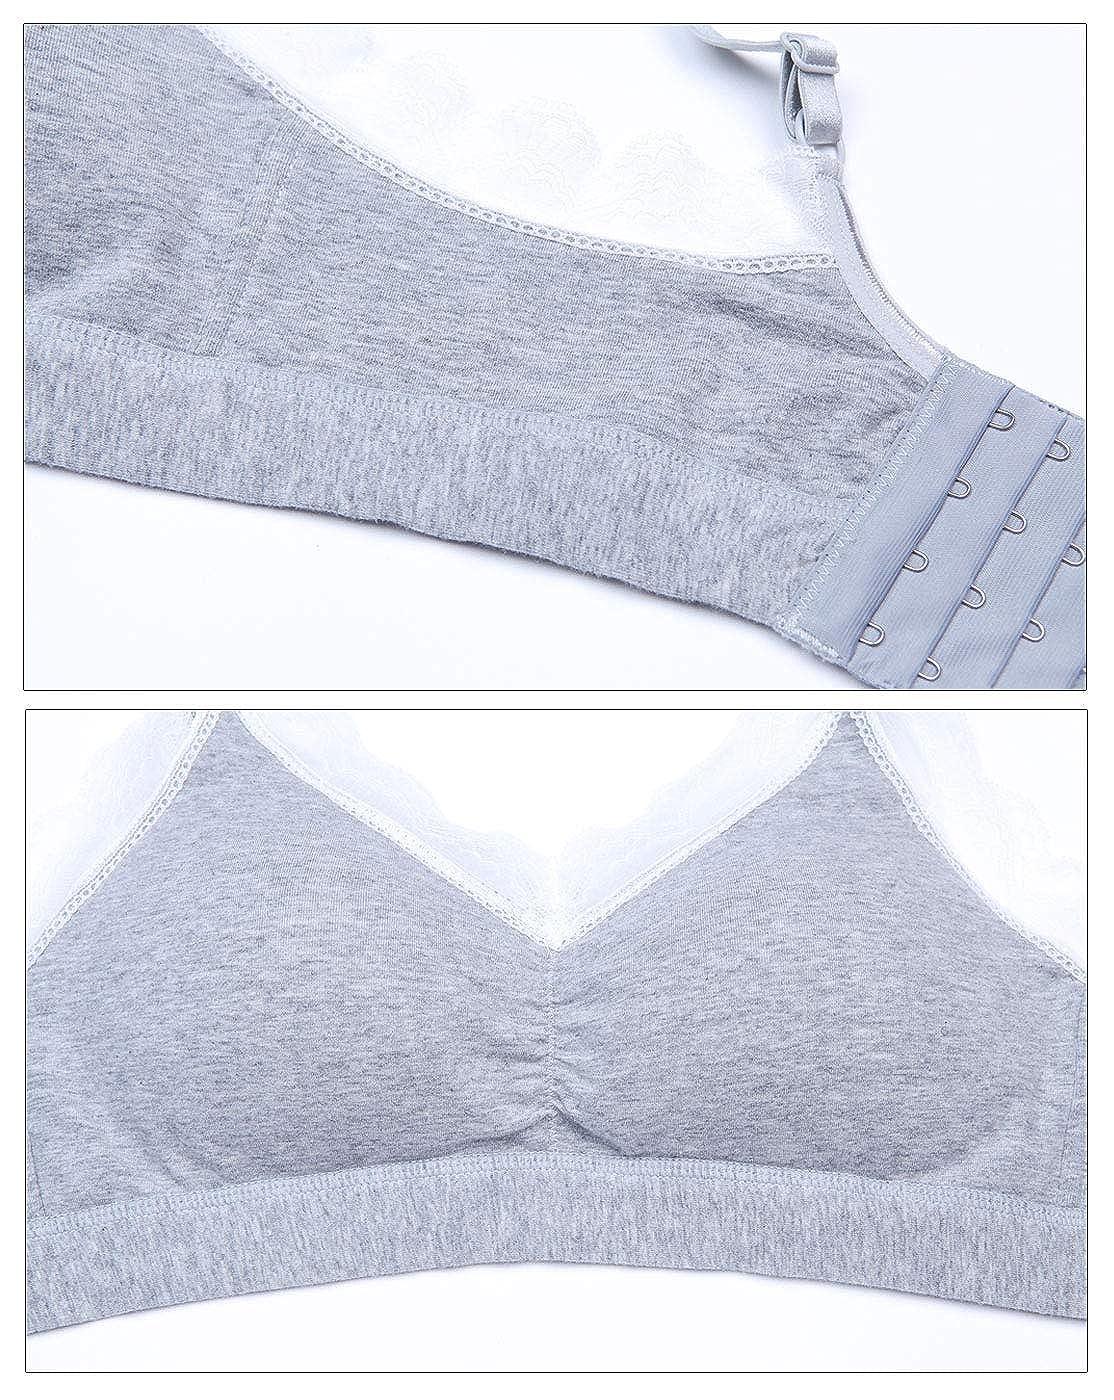 Aivtalk Wireless Lace Nursing Bra for Breastfeeding Plus Size Cotton Maternity Bra Seamless Lightly Sleep Bra